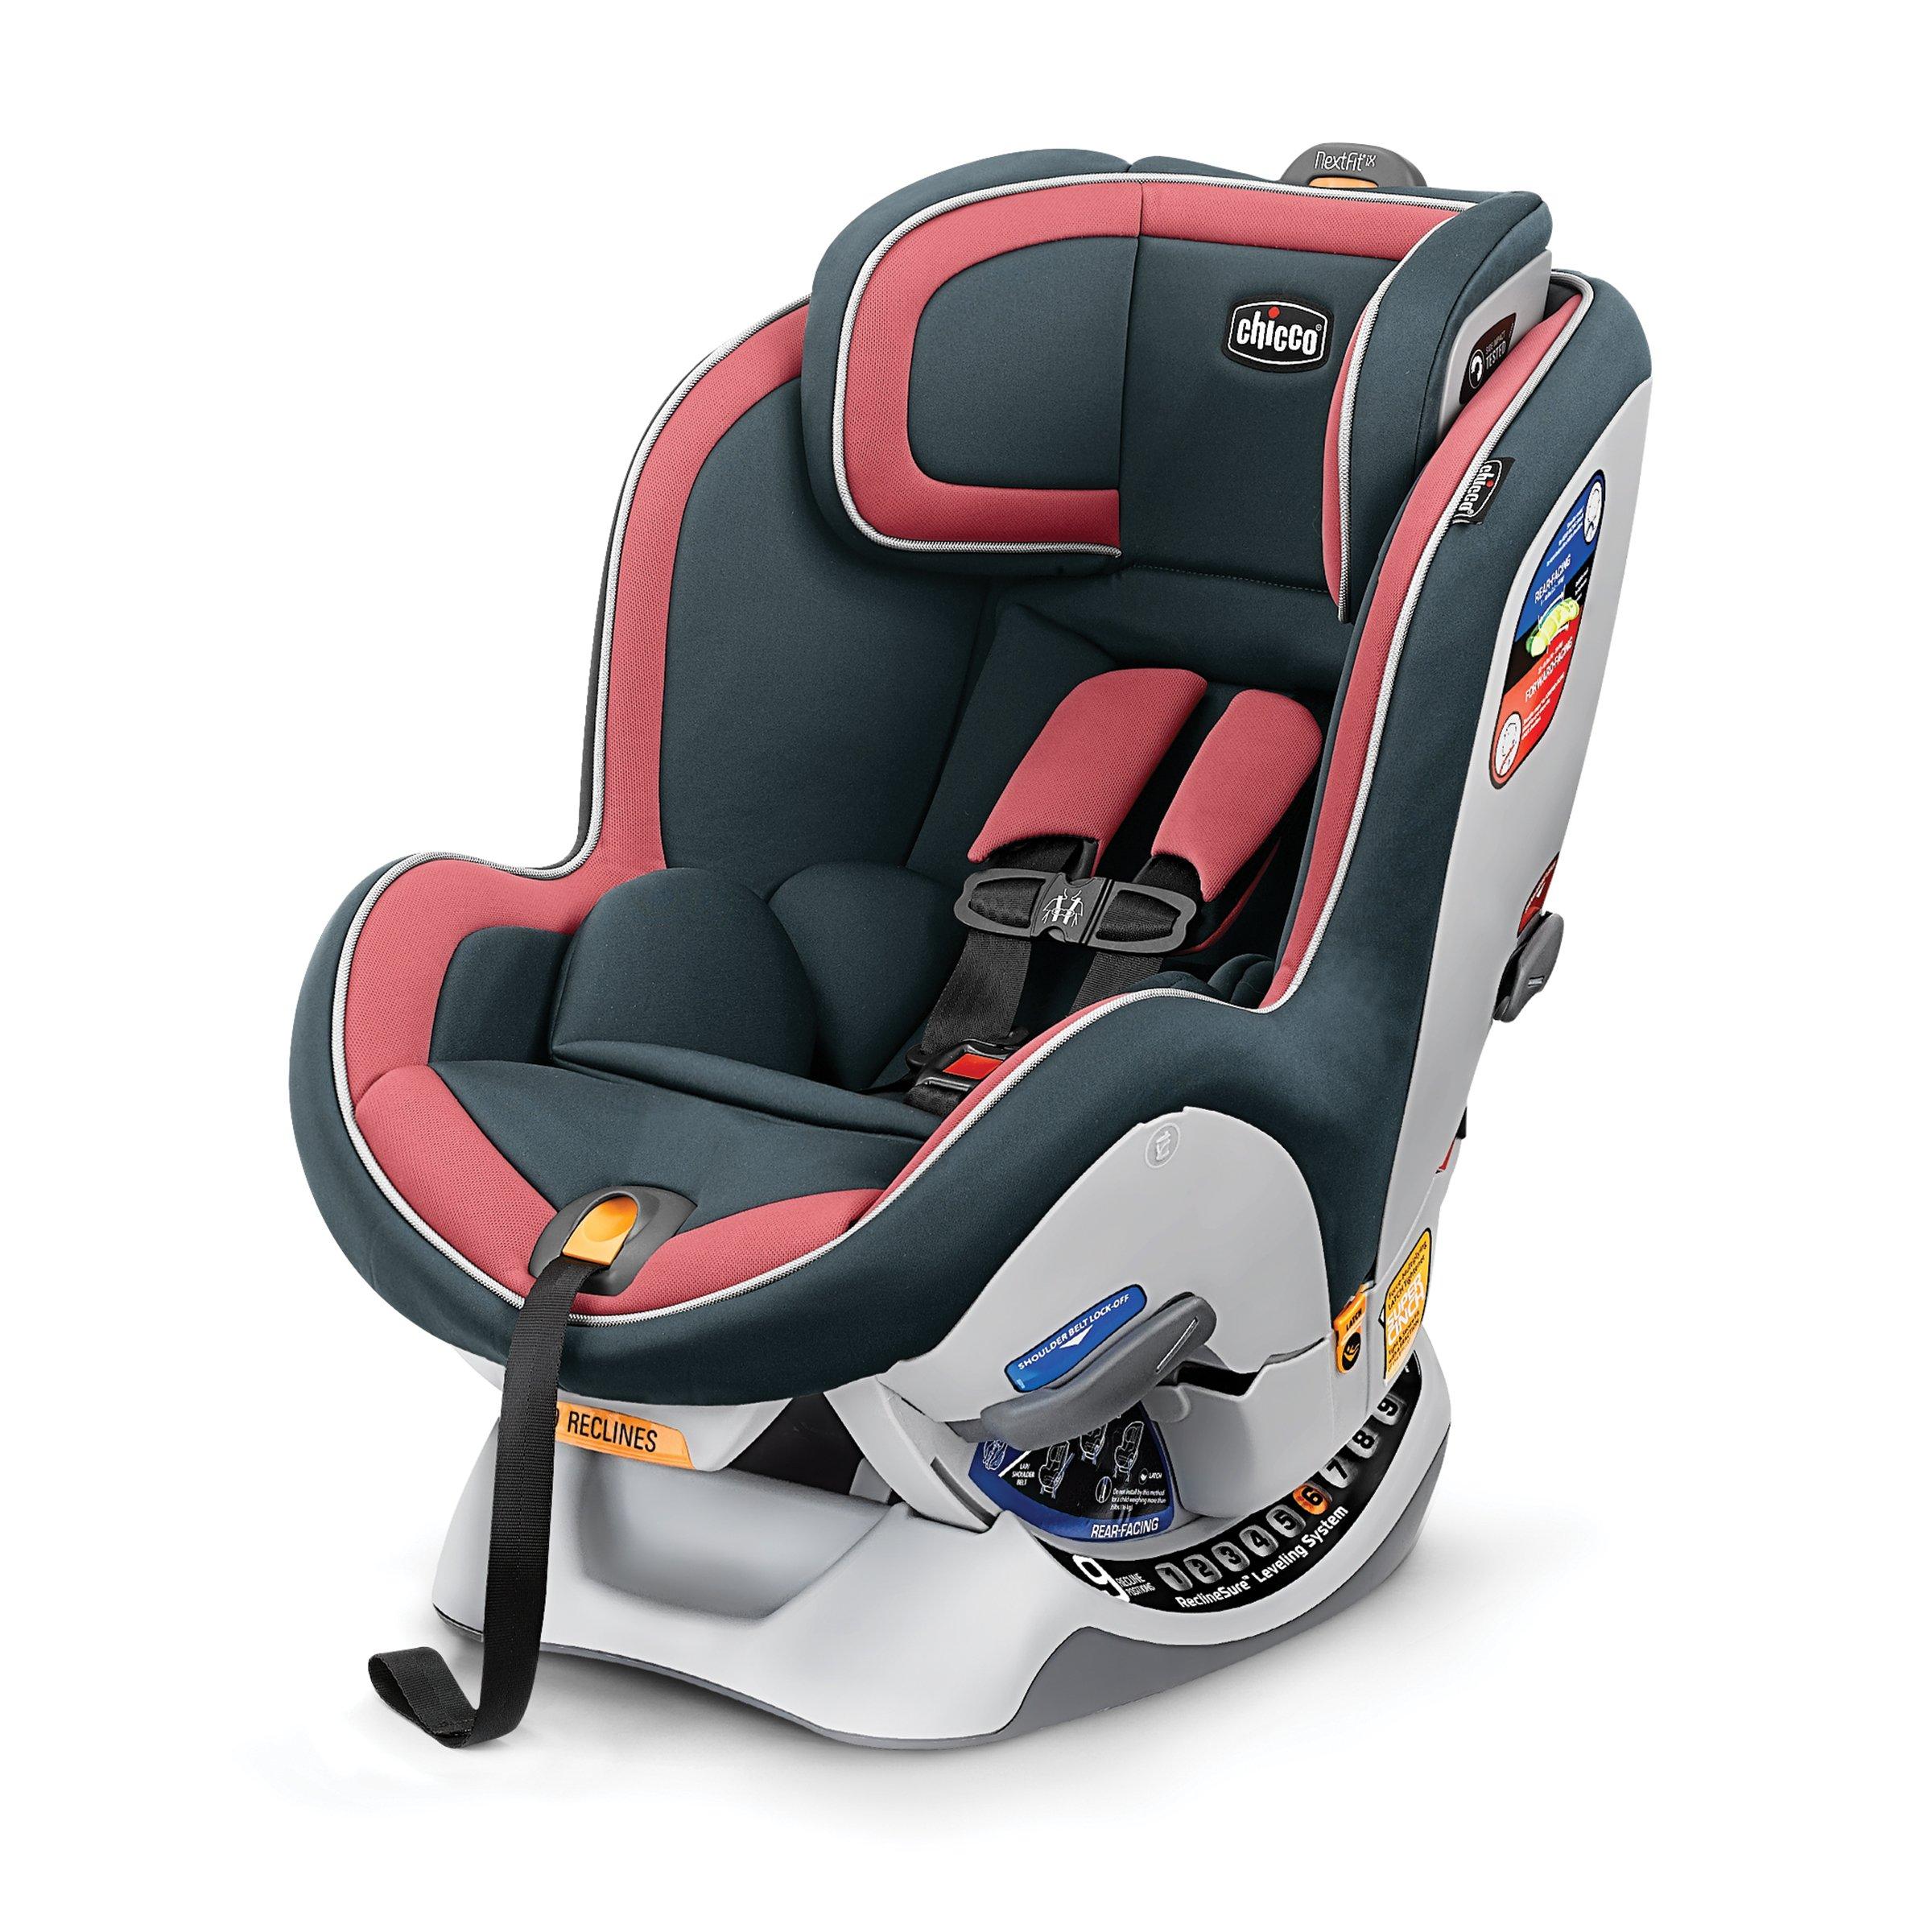 Chicco Next Fit IX Convertible Car Seat Sea Coral